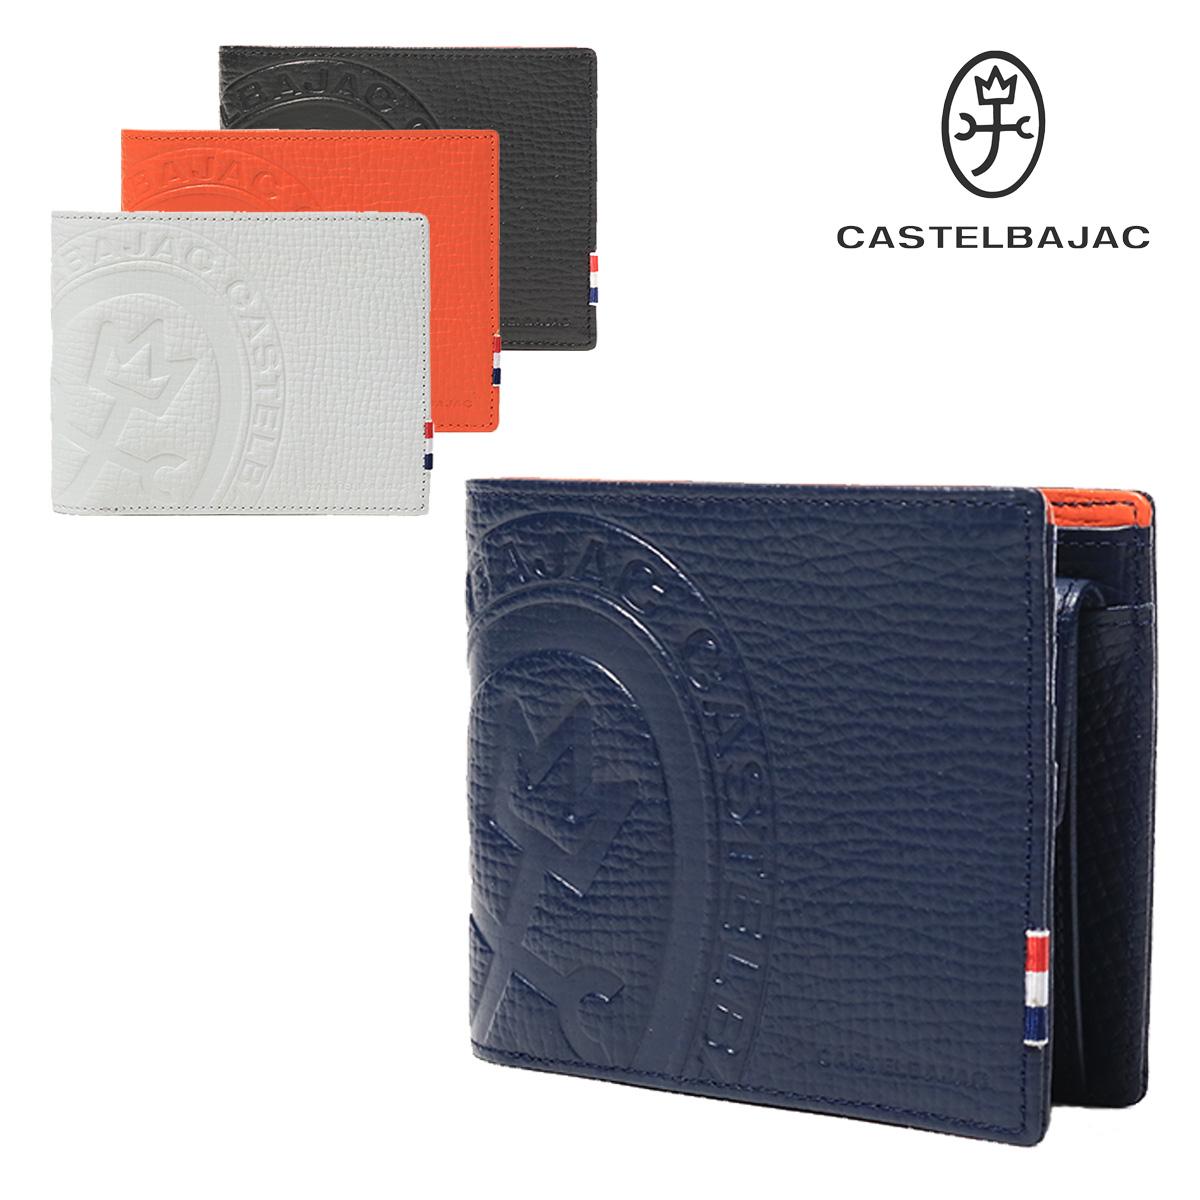 c451bd69fbbb 二つ折り財布 メンズ ピッコロ 022614 CASTELBAJAC RODEO CROWNS|ロデオクラウンズ 本革 レザー[bef]  カステルバジャック ハードケース 豊富な資源